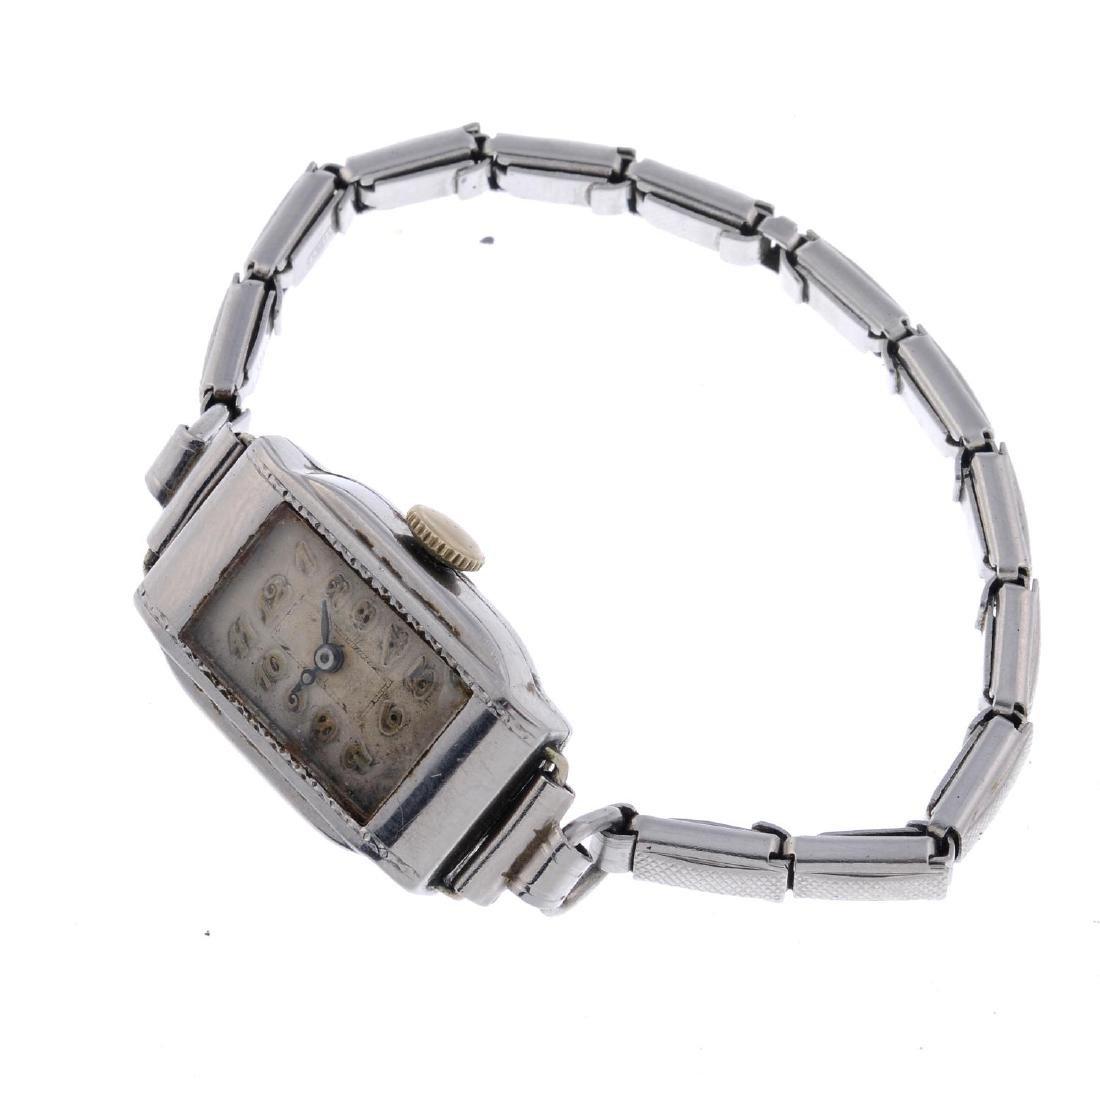 ROLEX - a lady's bracelet watch. Stainless steel case.